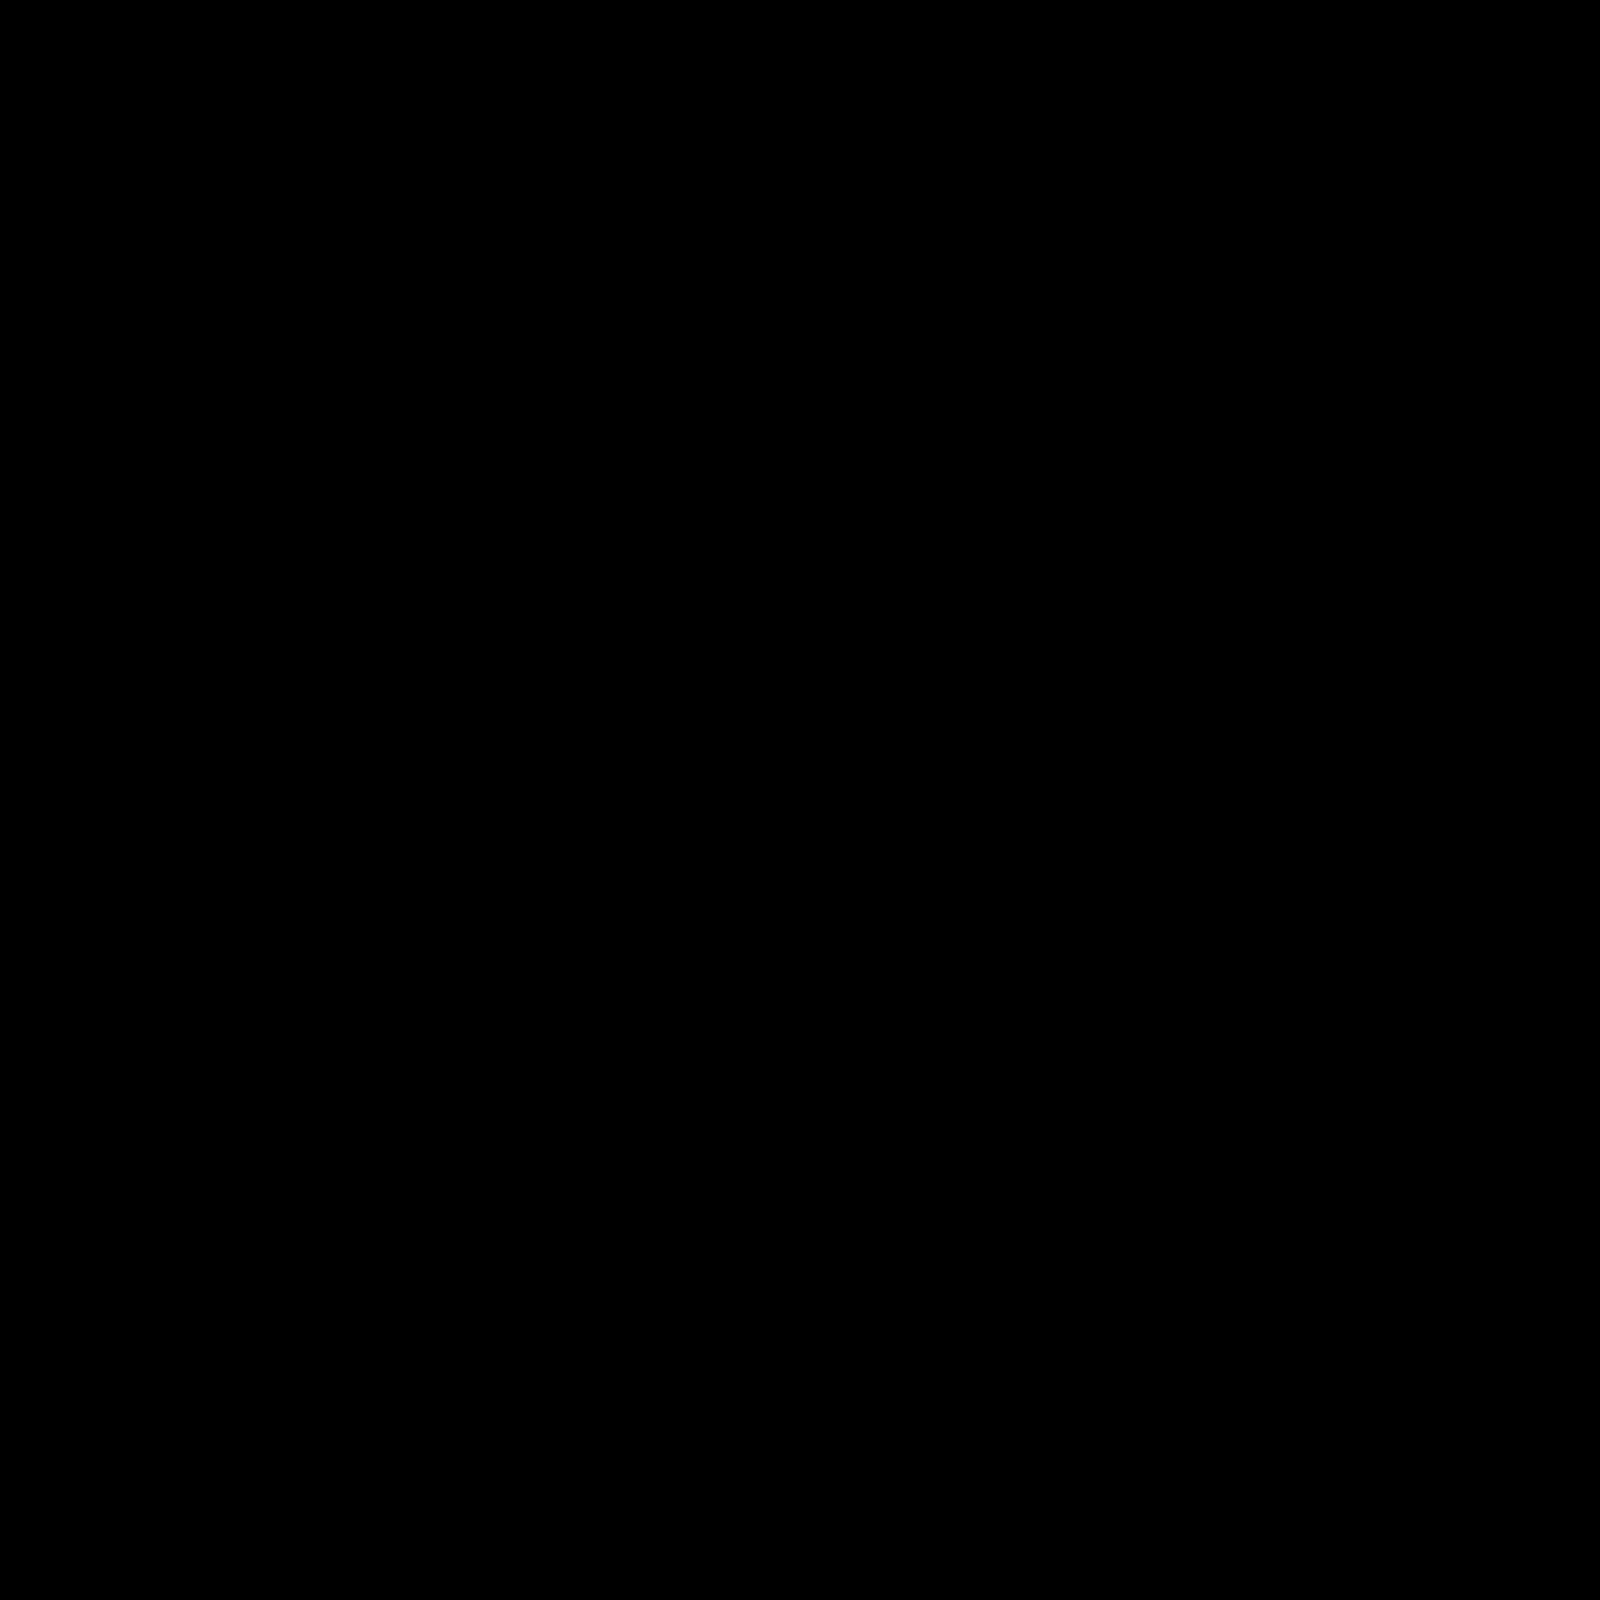 Postura icon